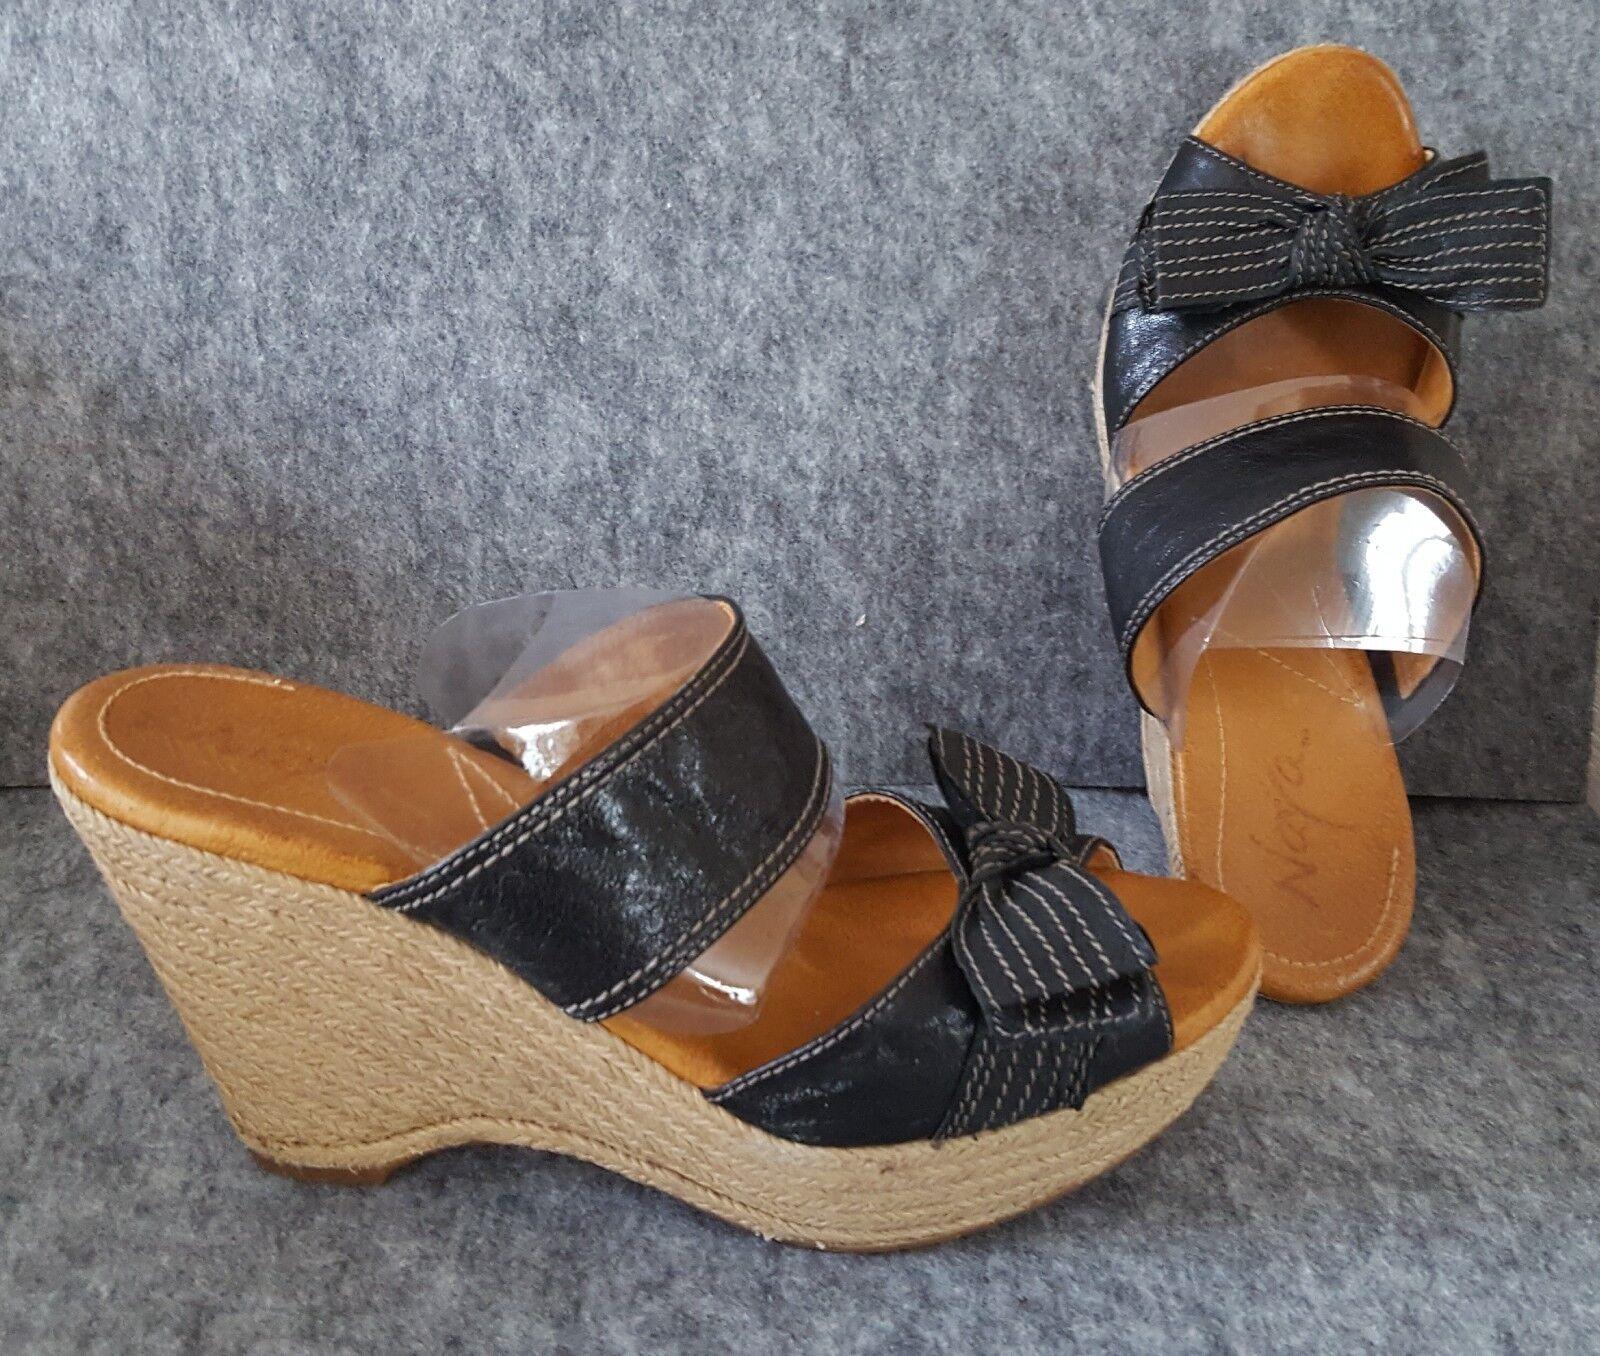 Sito ufficiale NAYA nero Platform Wedge Sandal - 10M     Gently worn, Comfortable  Sconto del 70% a buon mercato